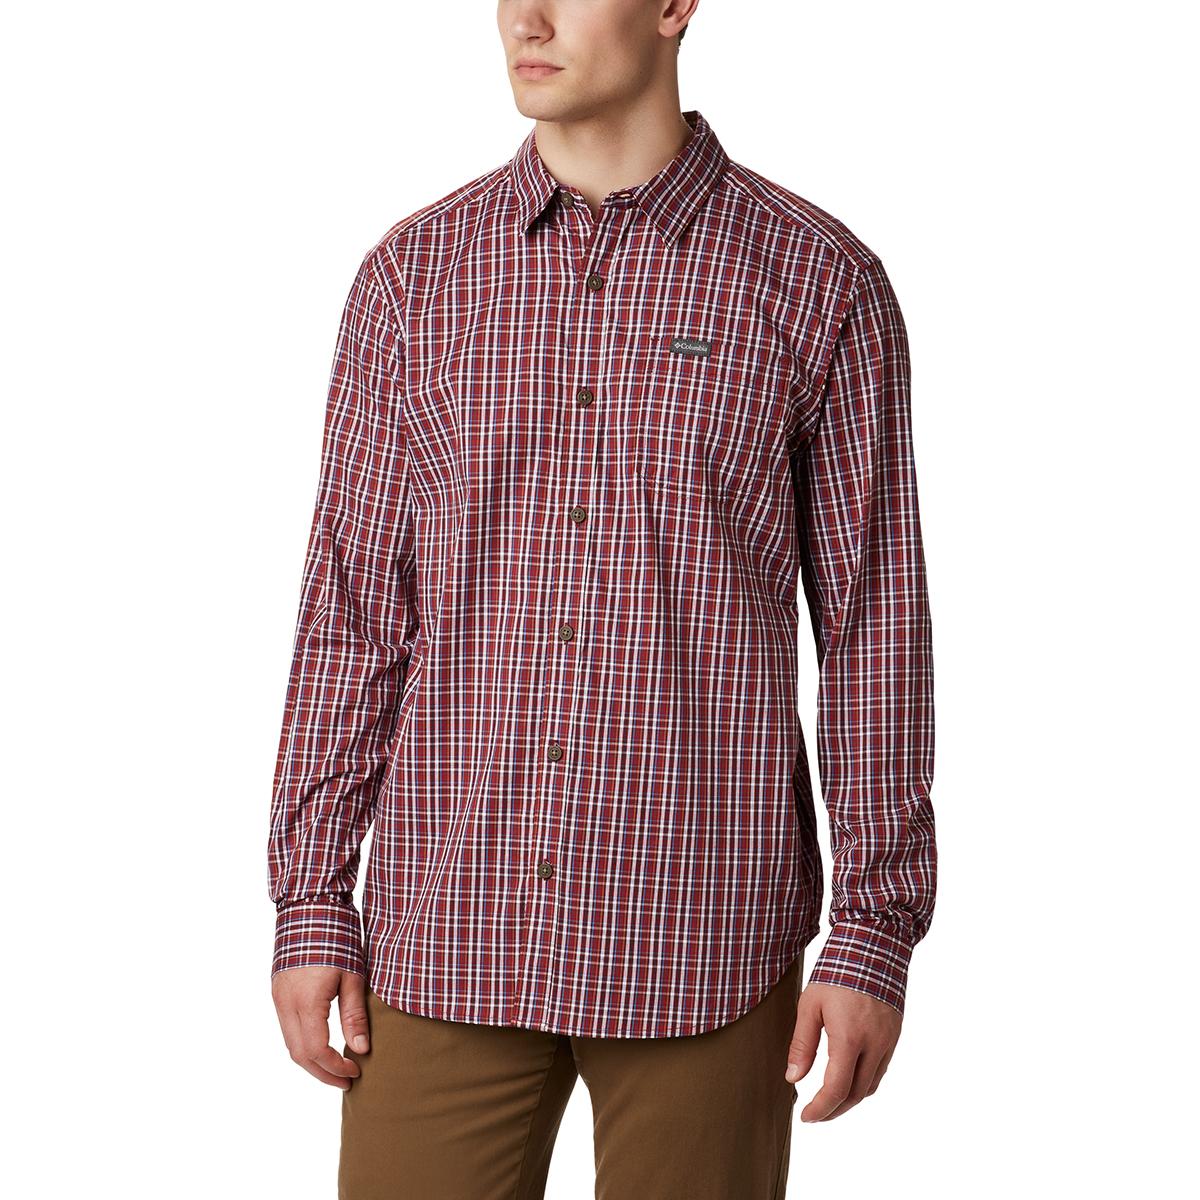 Columbia Men's Vapor Ridge Iii Long-Sleeve Shirt - Red, XL